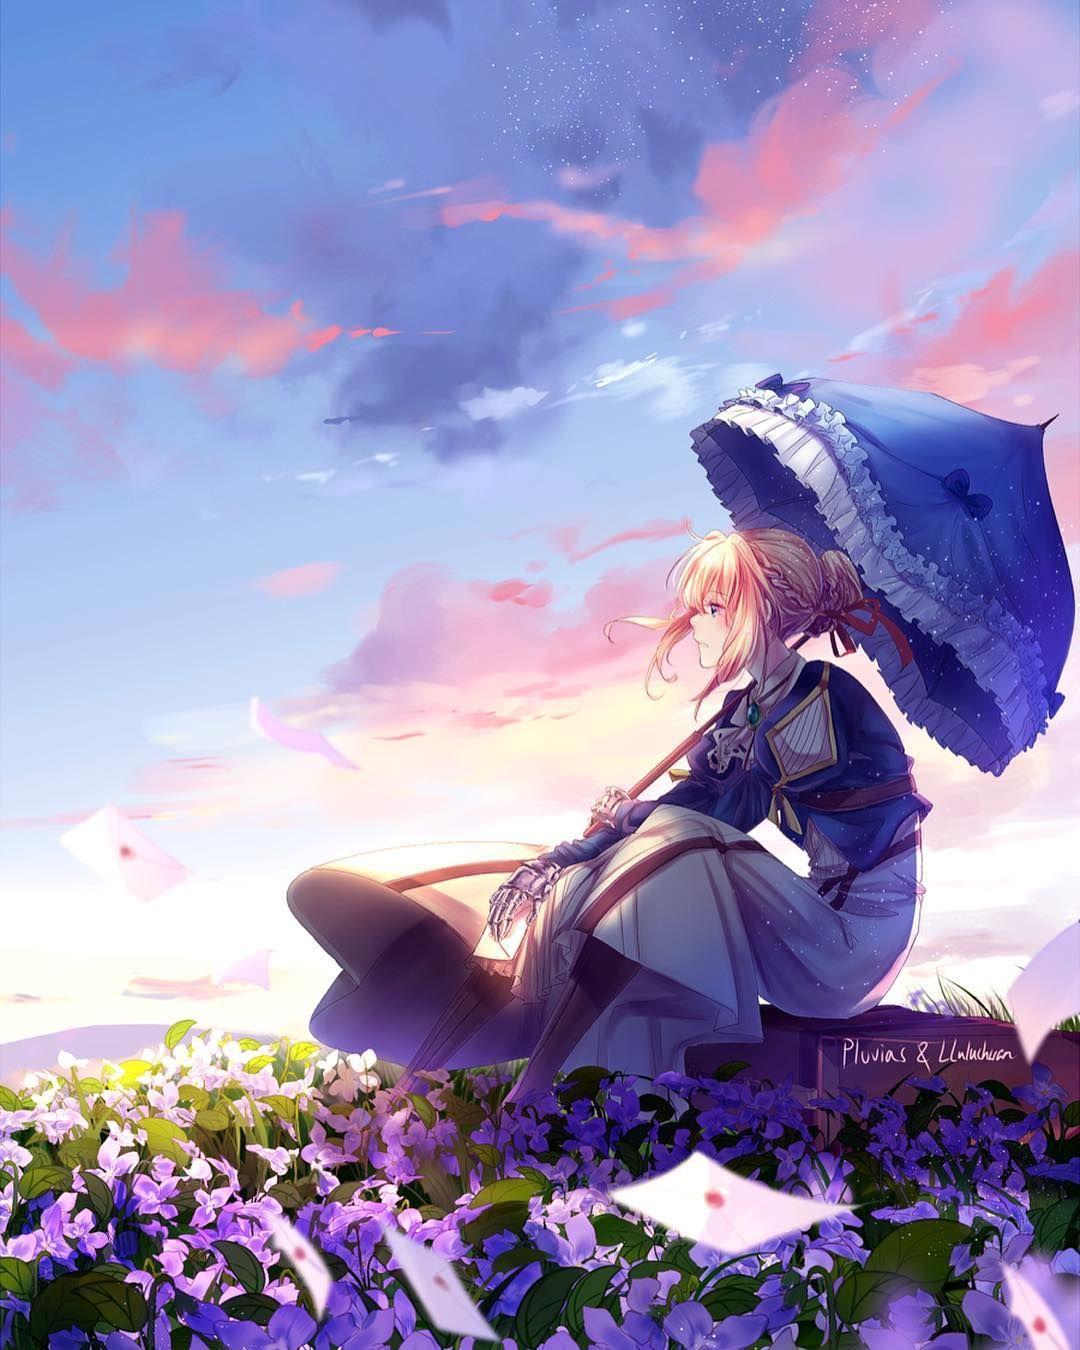 Violet Evergarden VioletEvergarden animes violet